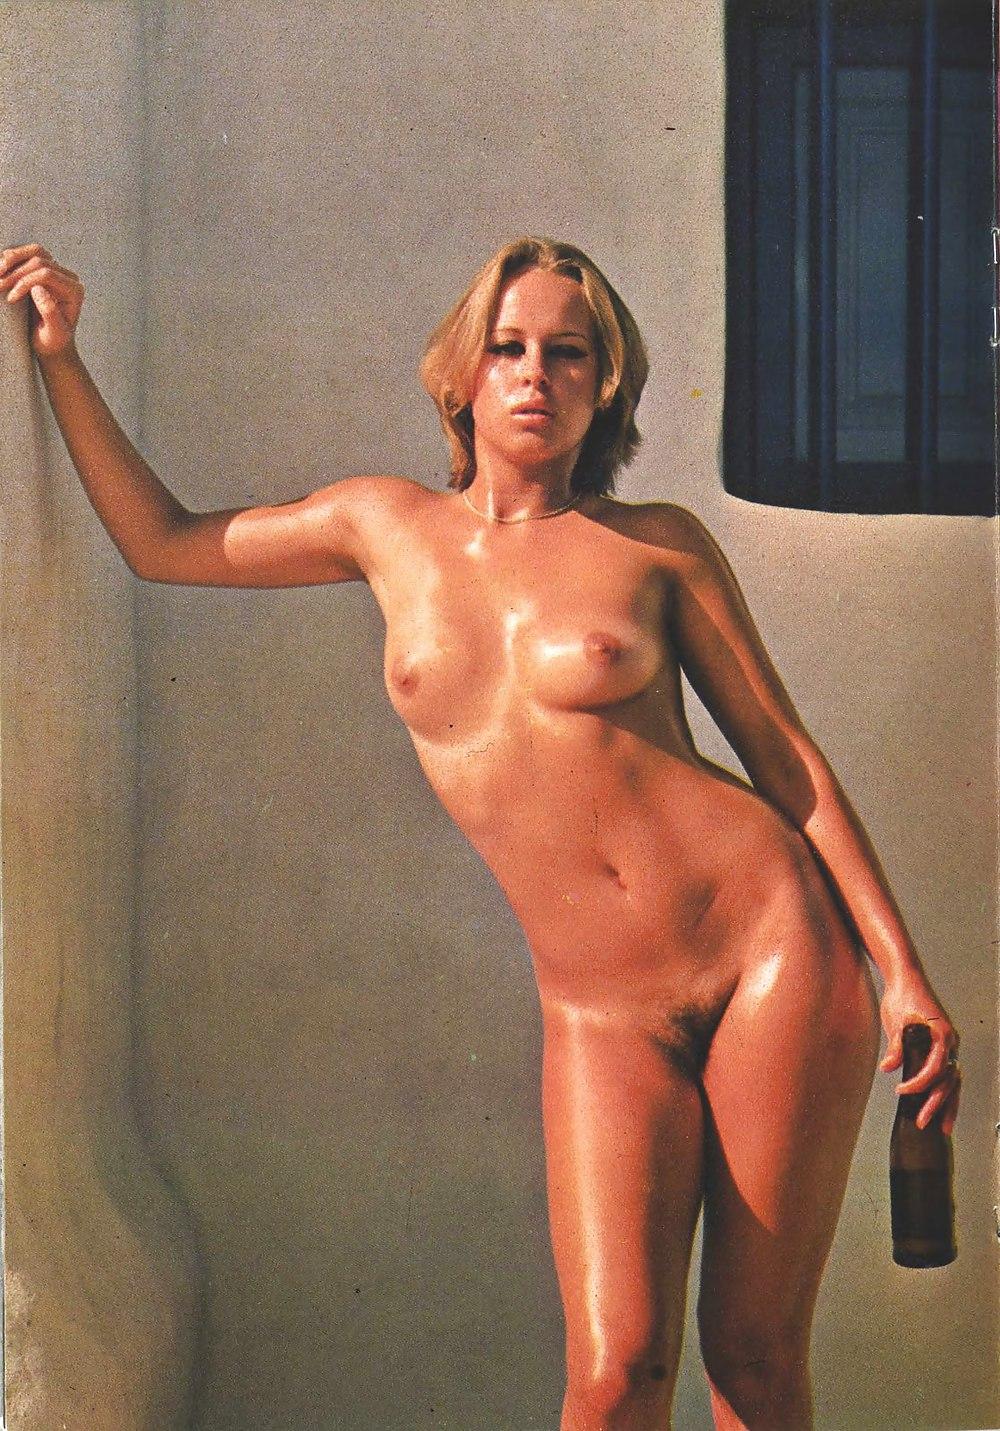 Susie ann nude